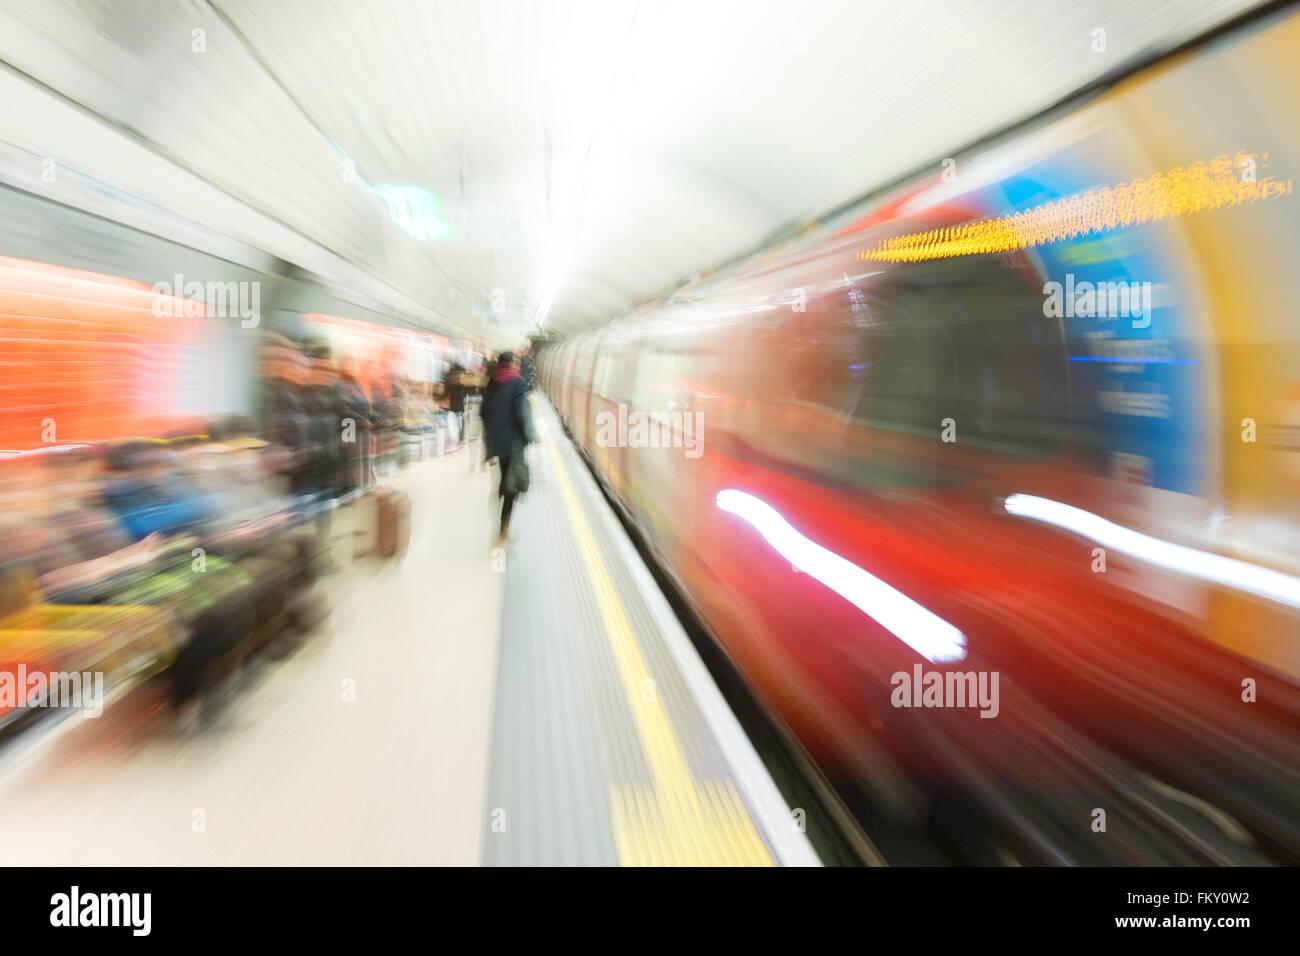 Motion blurred image of a London Underground train arriving at a station platform, Green Park Station, London UK - Stock Image